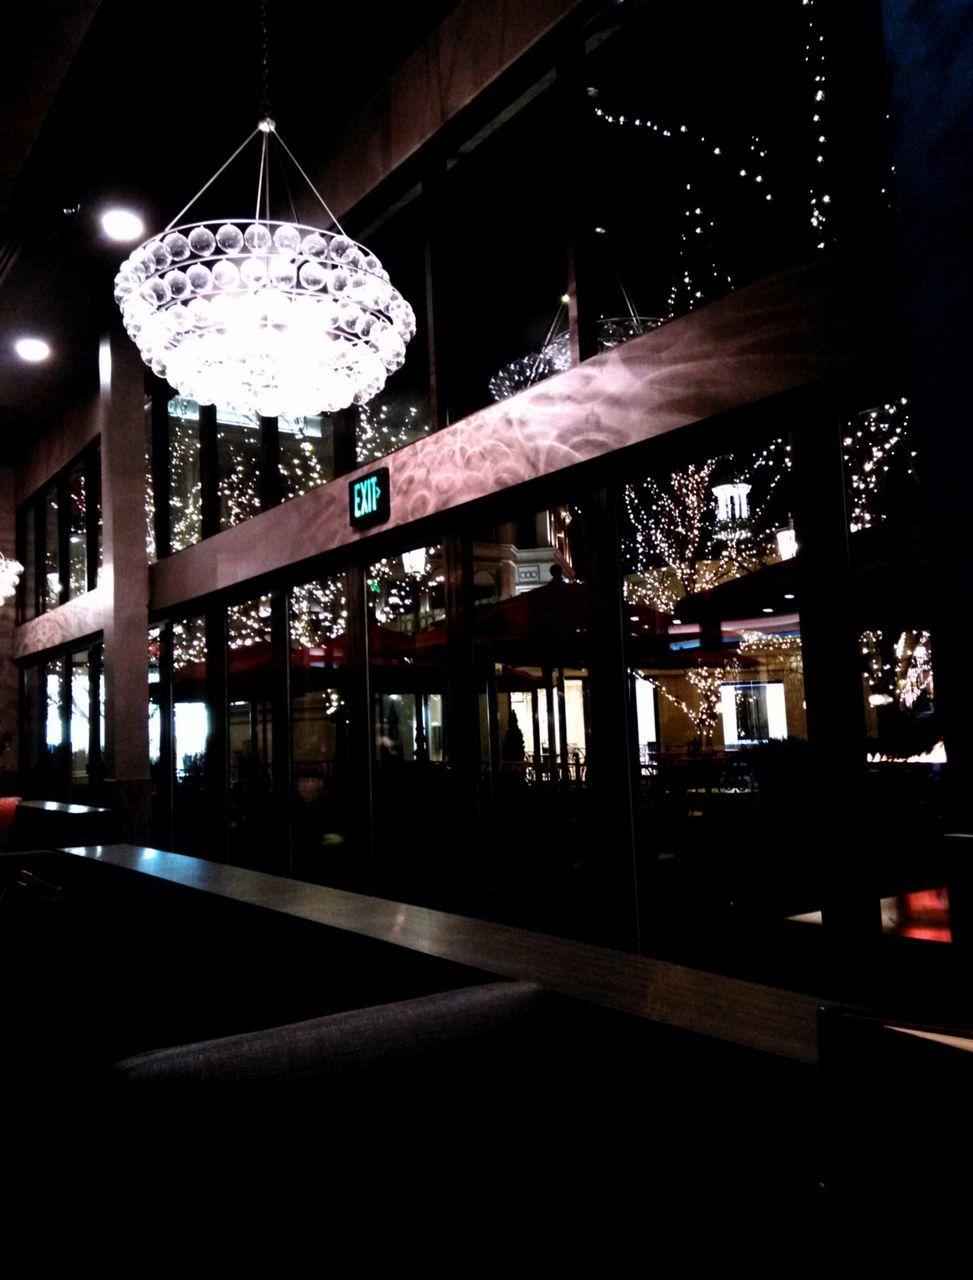 hanging, illuminated, lighting equipment, indoors, night, built structure, no people, architecture, tree, city